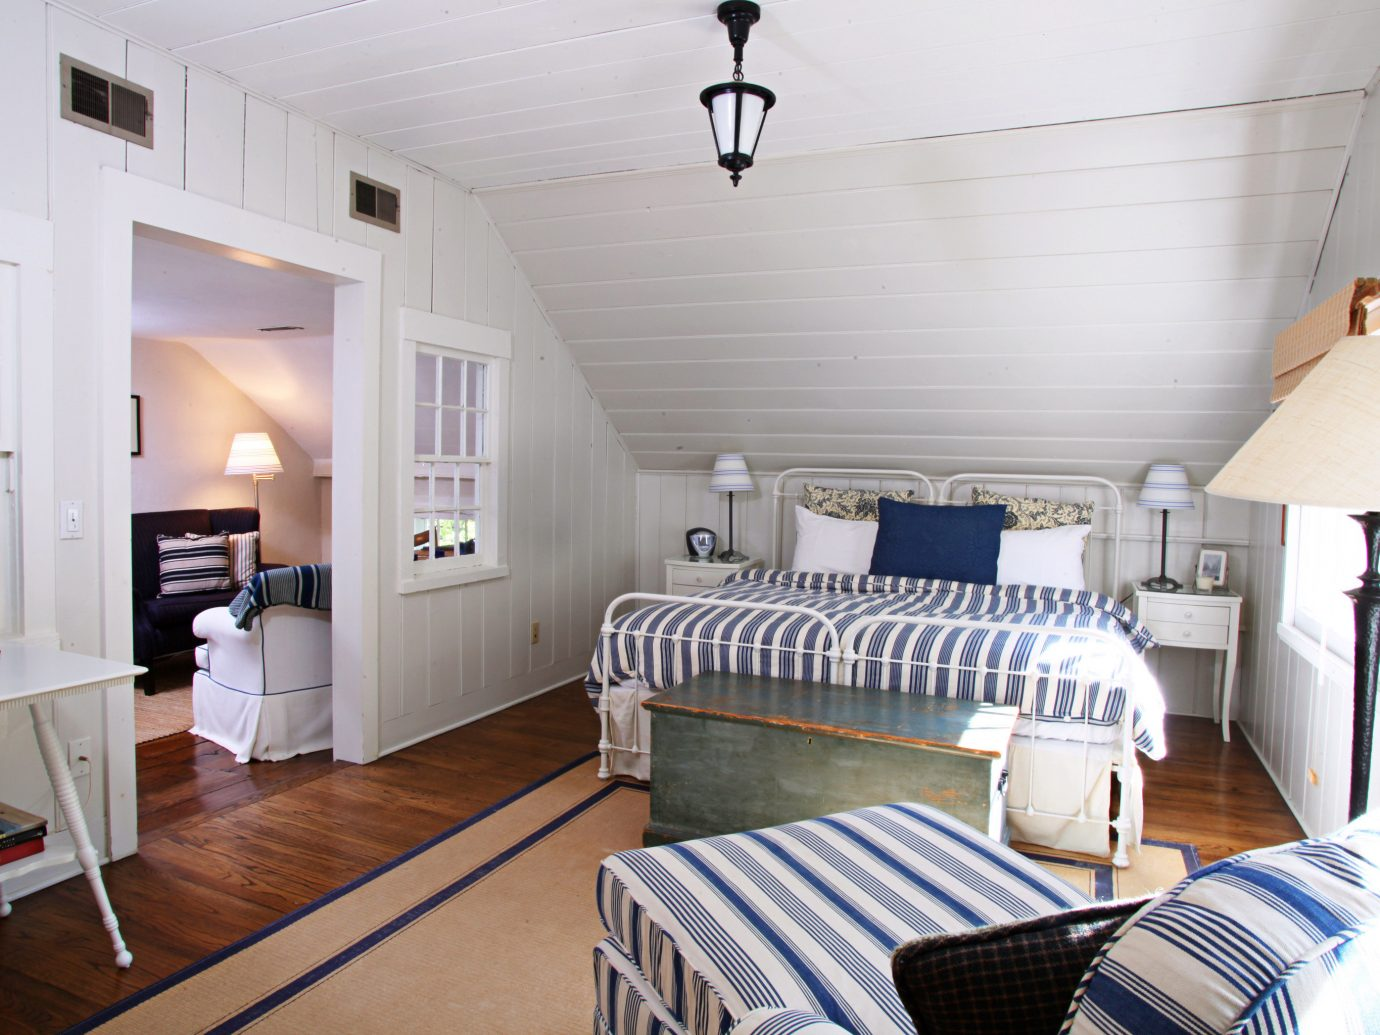 Bedroom Country Elegant Inn indoor floor wall room property Living ceiling real estate estate cottage interior design home living room furniture Design apartment loft area